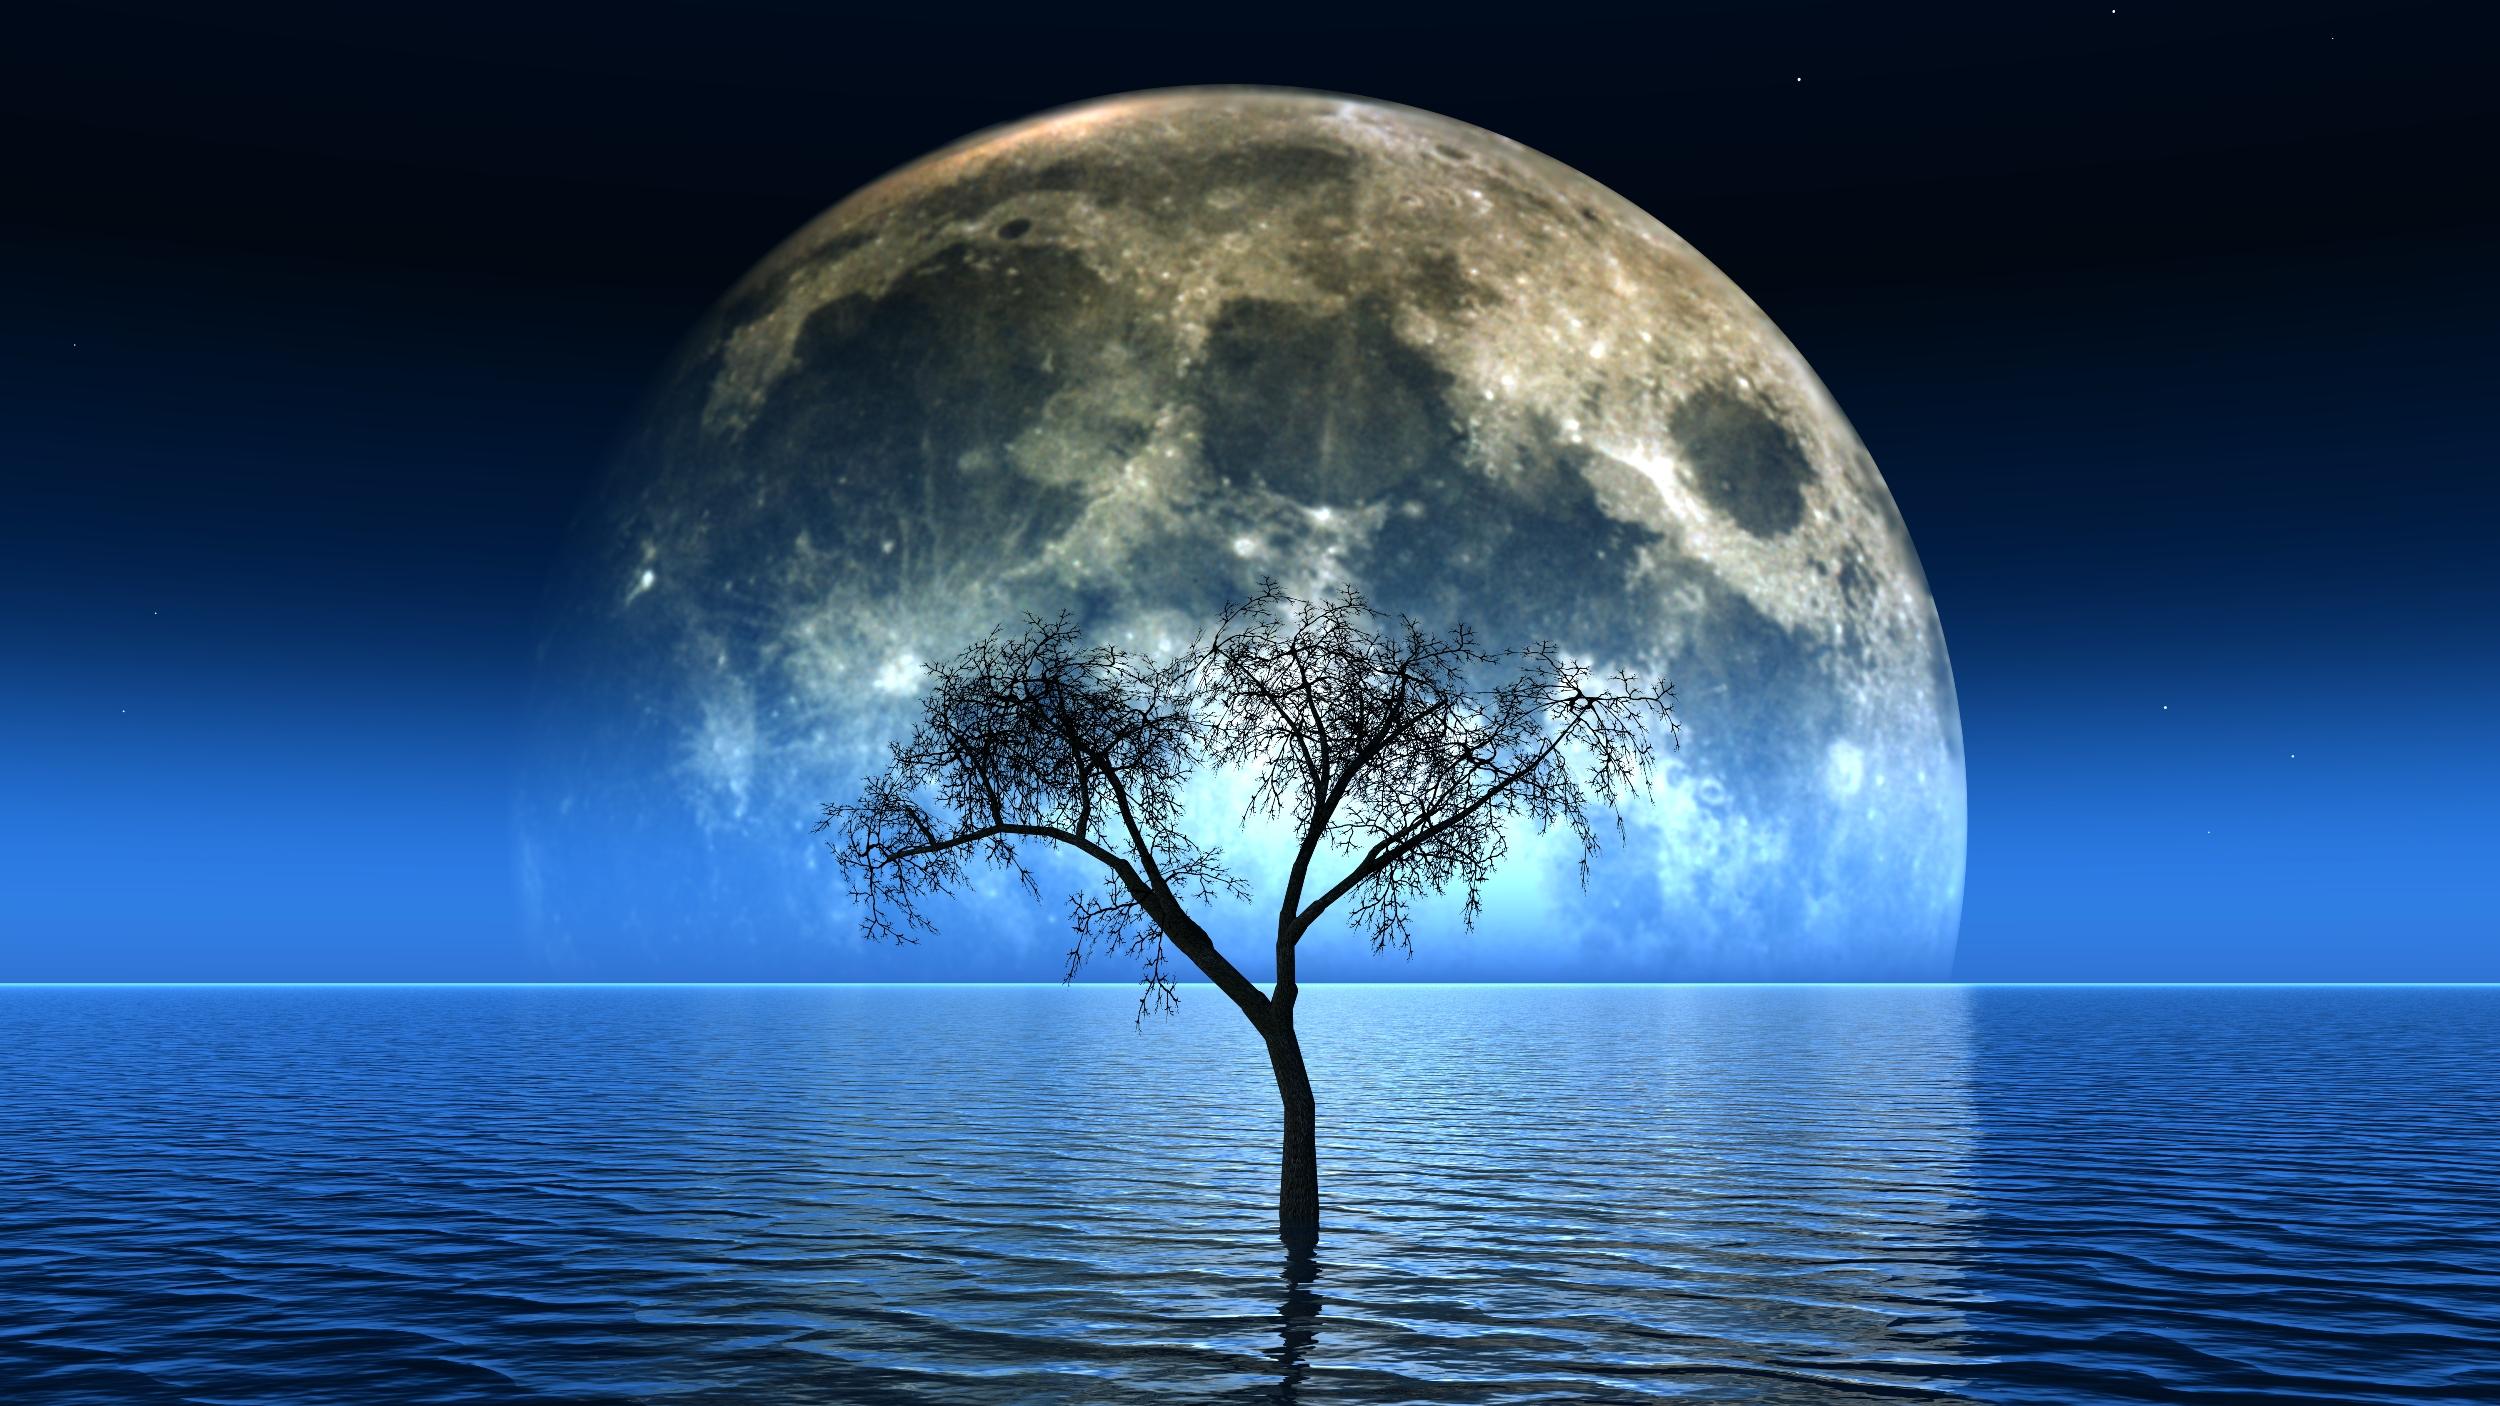 صور وخلفيات  قمر ونجوم